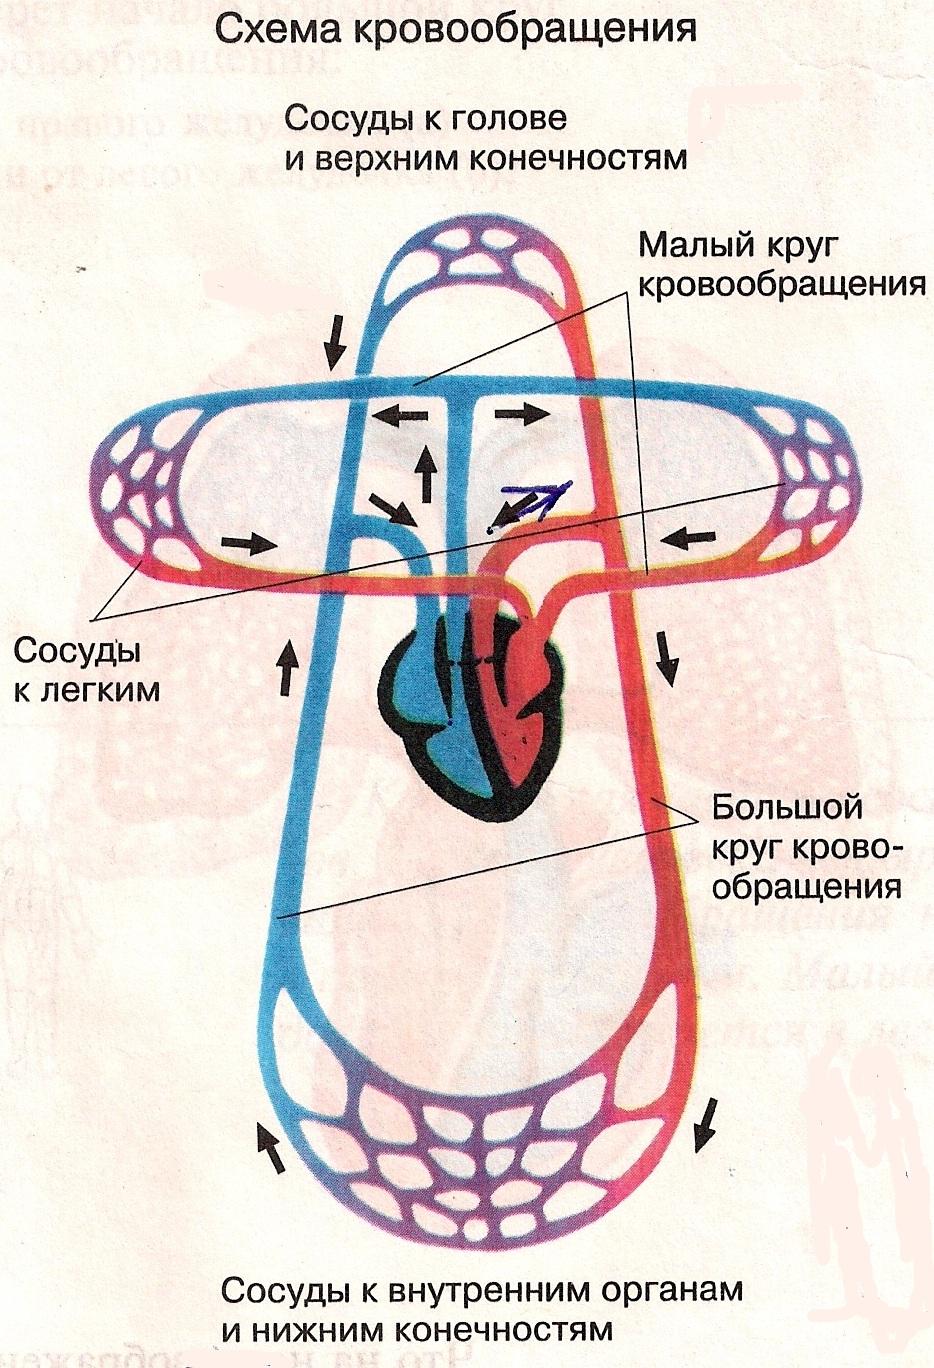 круги кровообращений картинки: http://mazurv.ru/page/krugi_krovoobrashenii_kartinki/